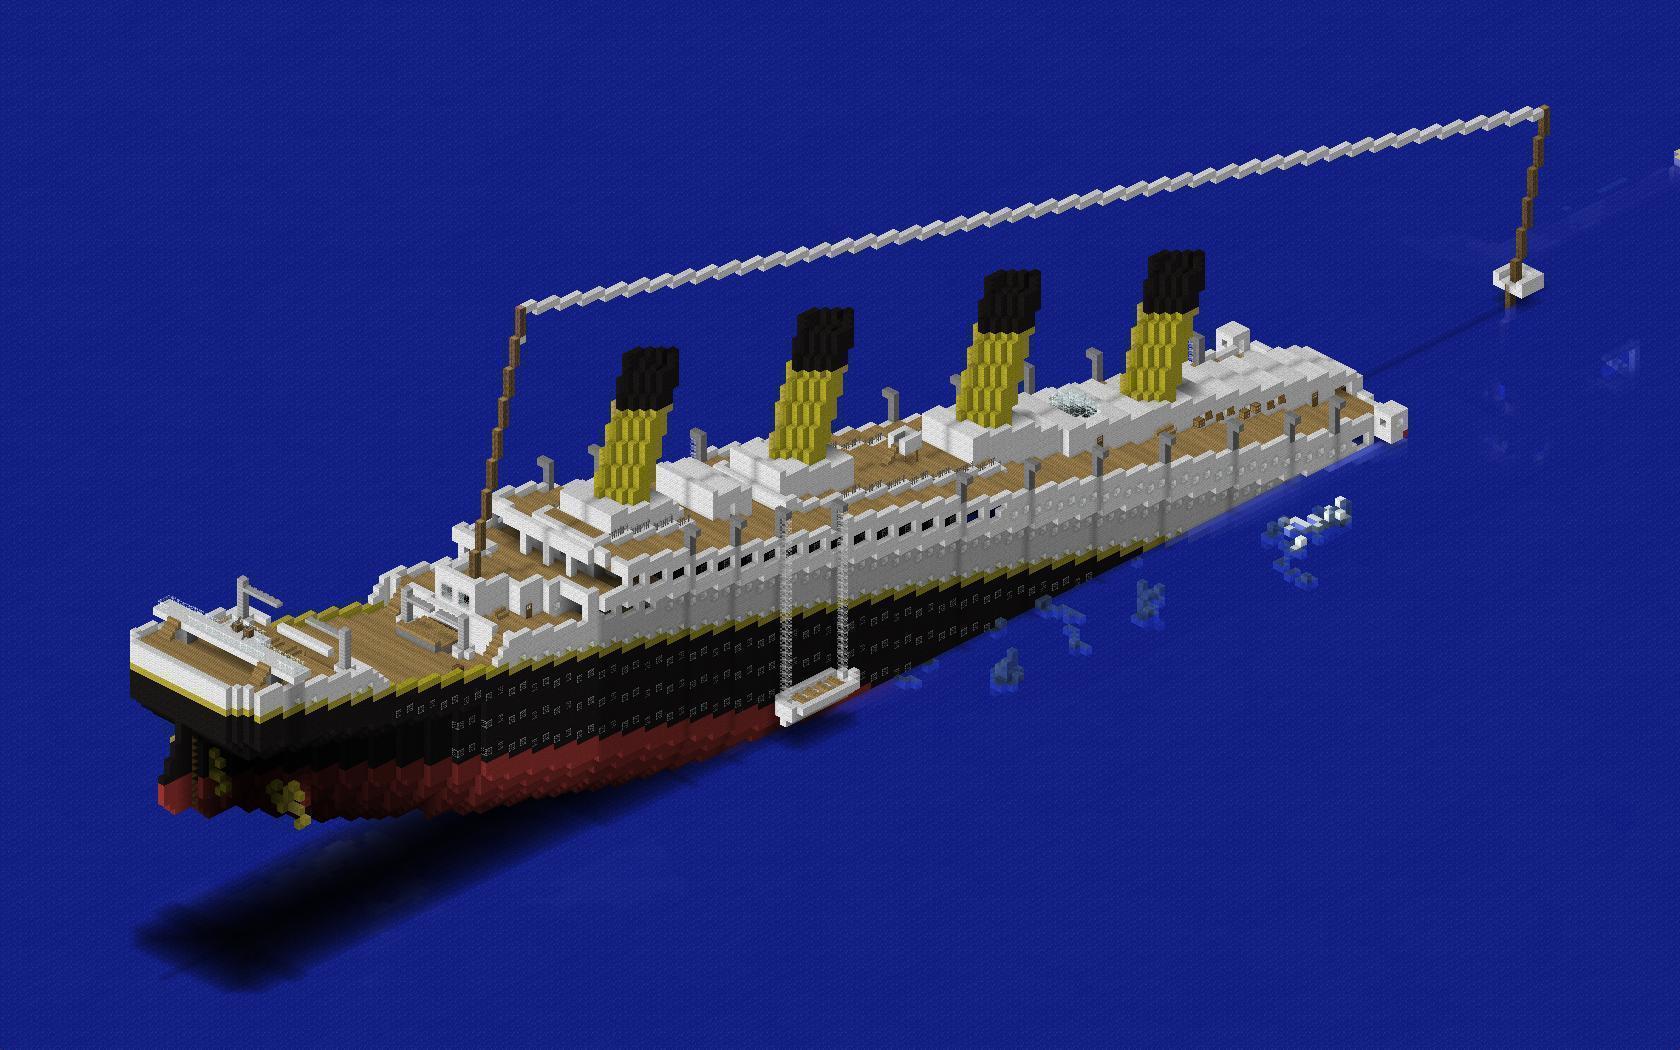 28 Who Made The Titanic Sink The Titanic Headline